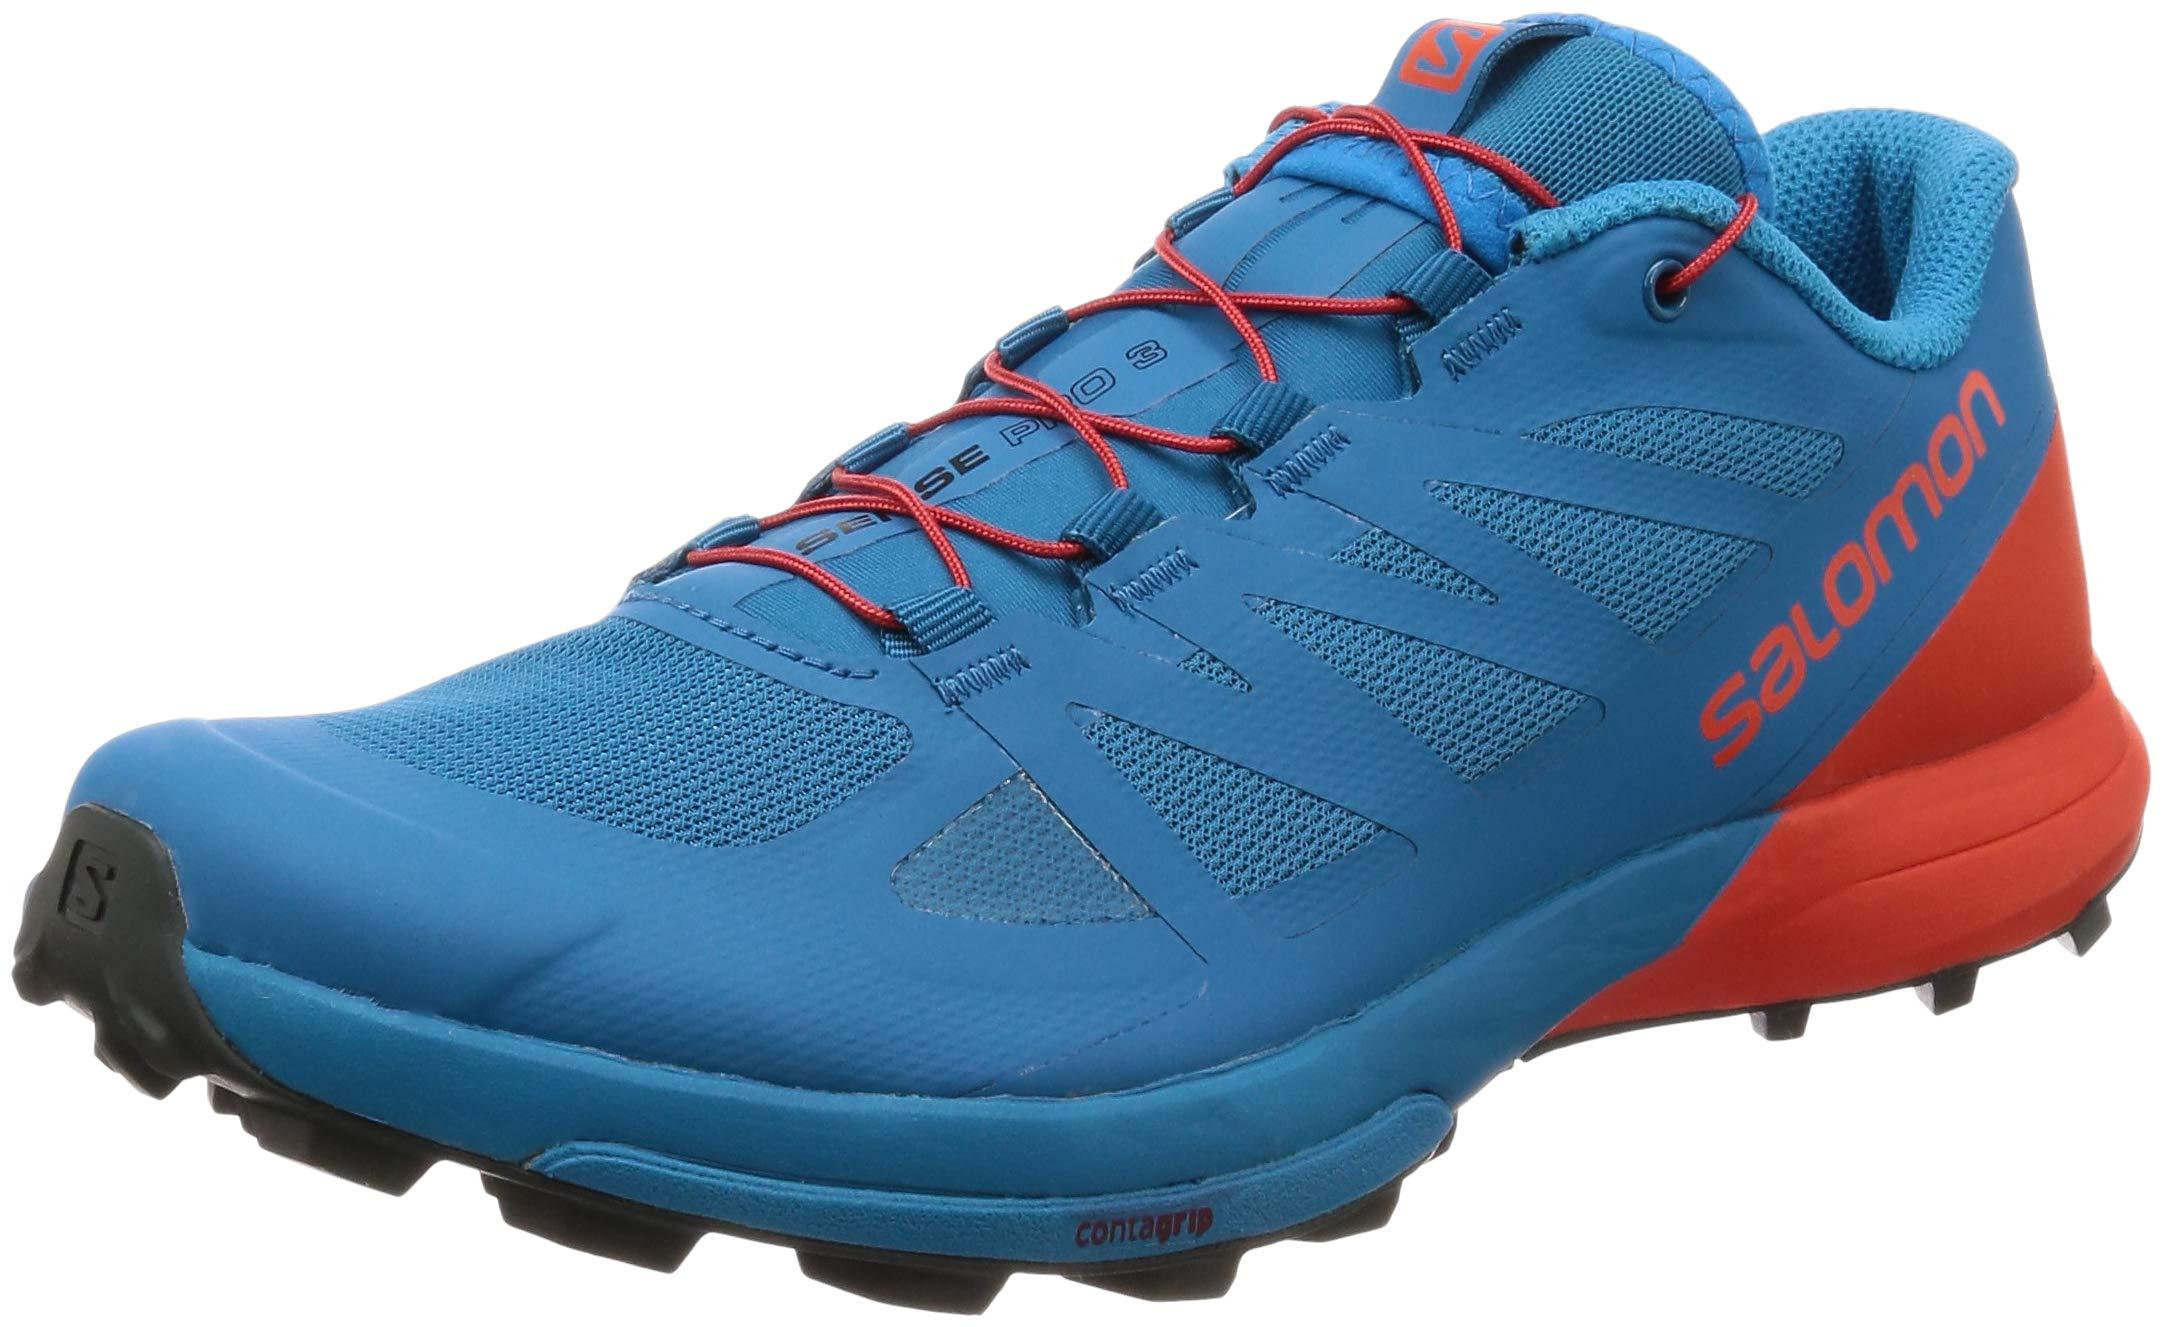 Salomon Men's Sense PRO 3 Sneaker, Fjord Blue/Cherry Tomato/Urban Chic